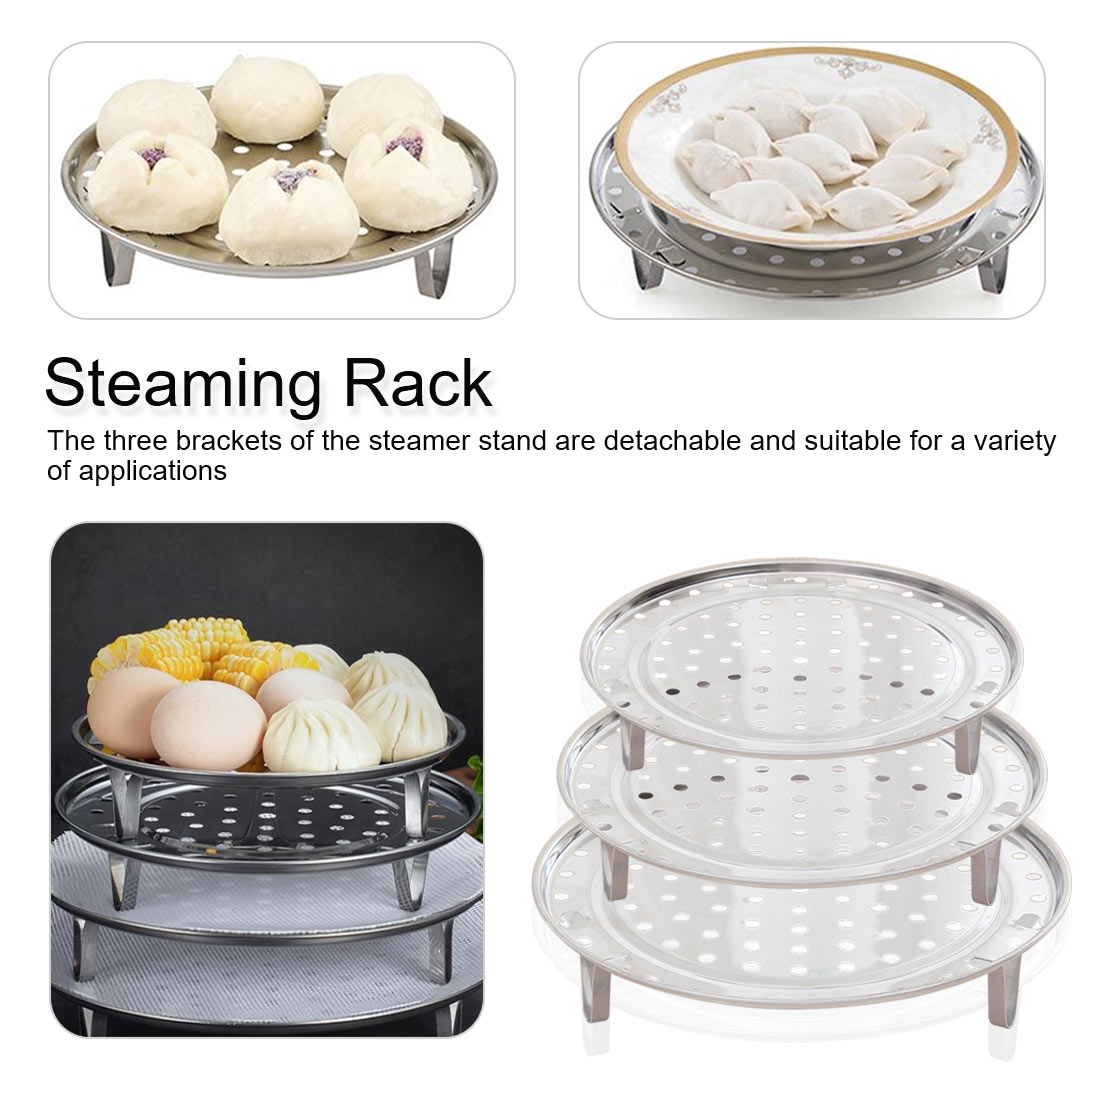 Stainless Steel Steamer Kitchen Cookware Steamer Rack Insert Stock Cooking Steaming Stand Kitchen Heating Supplies